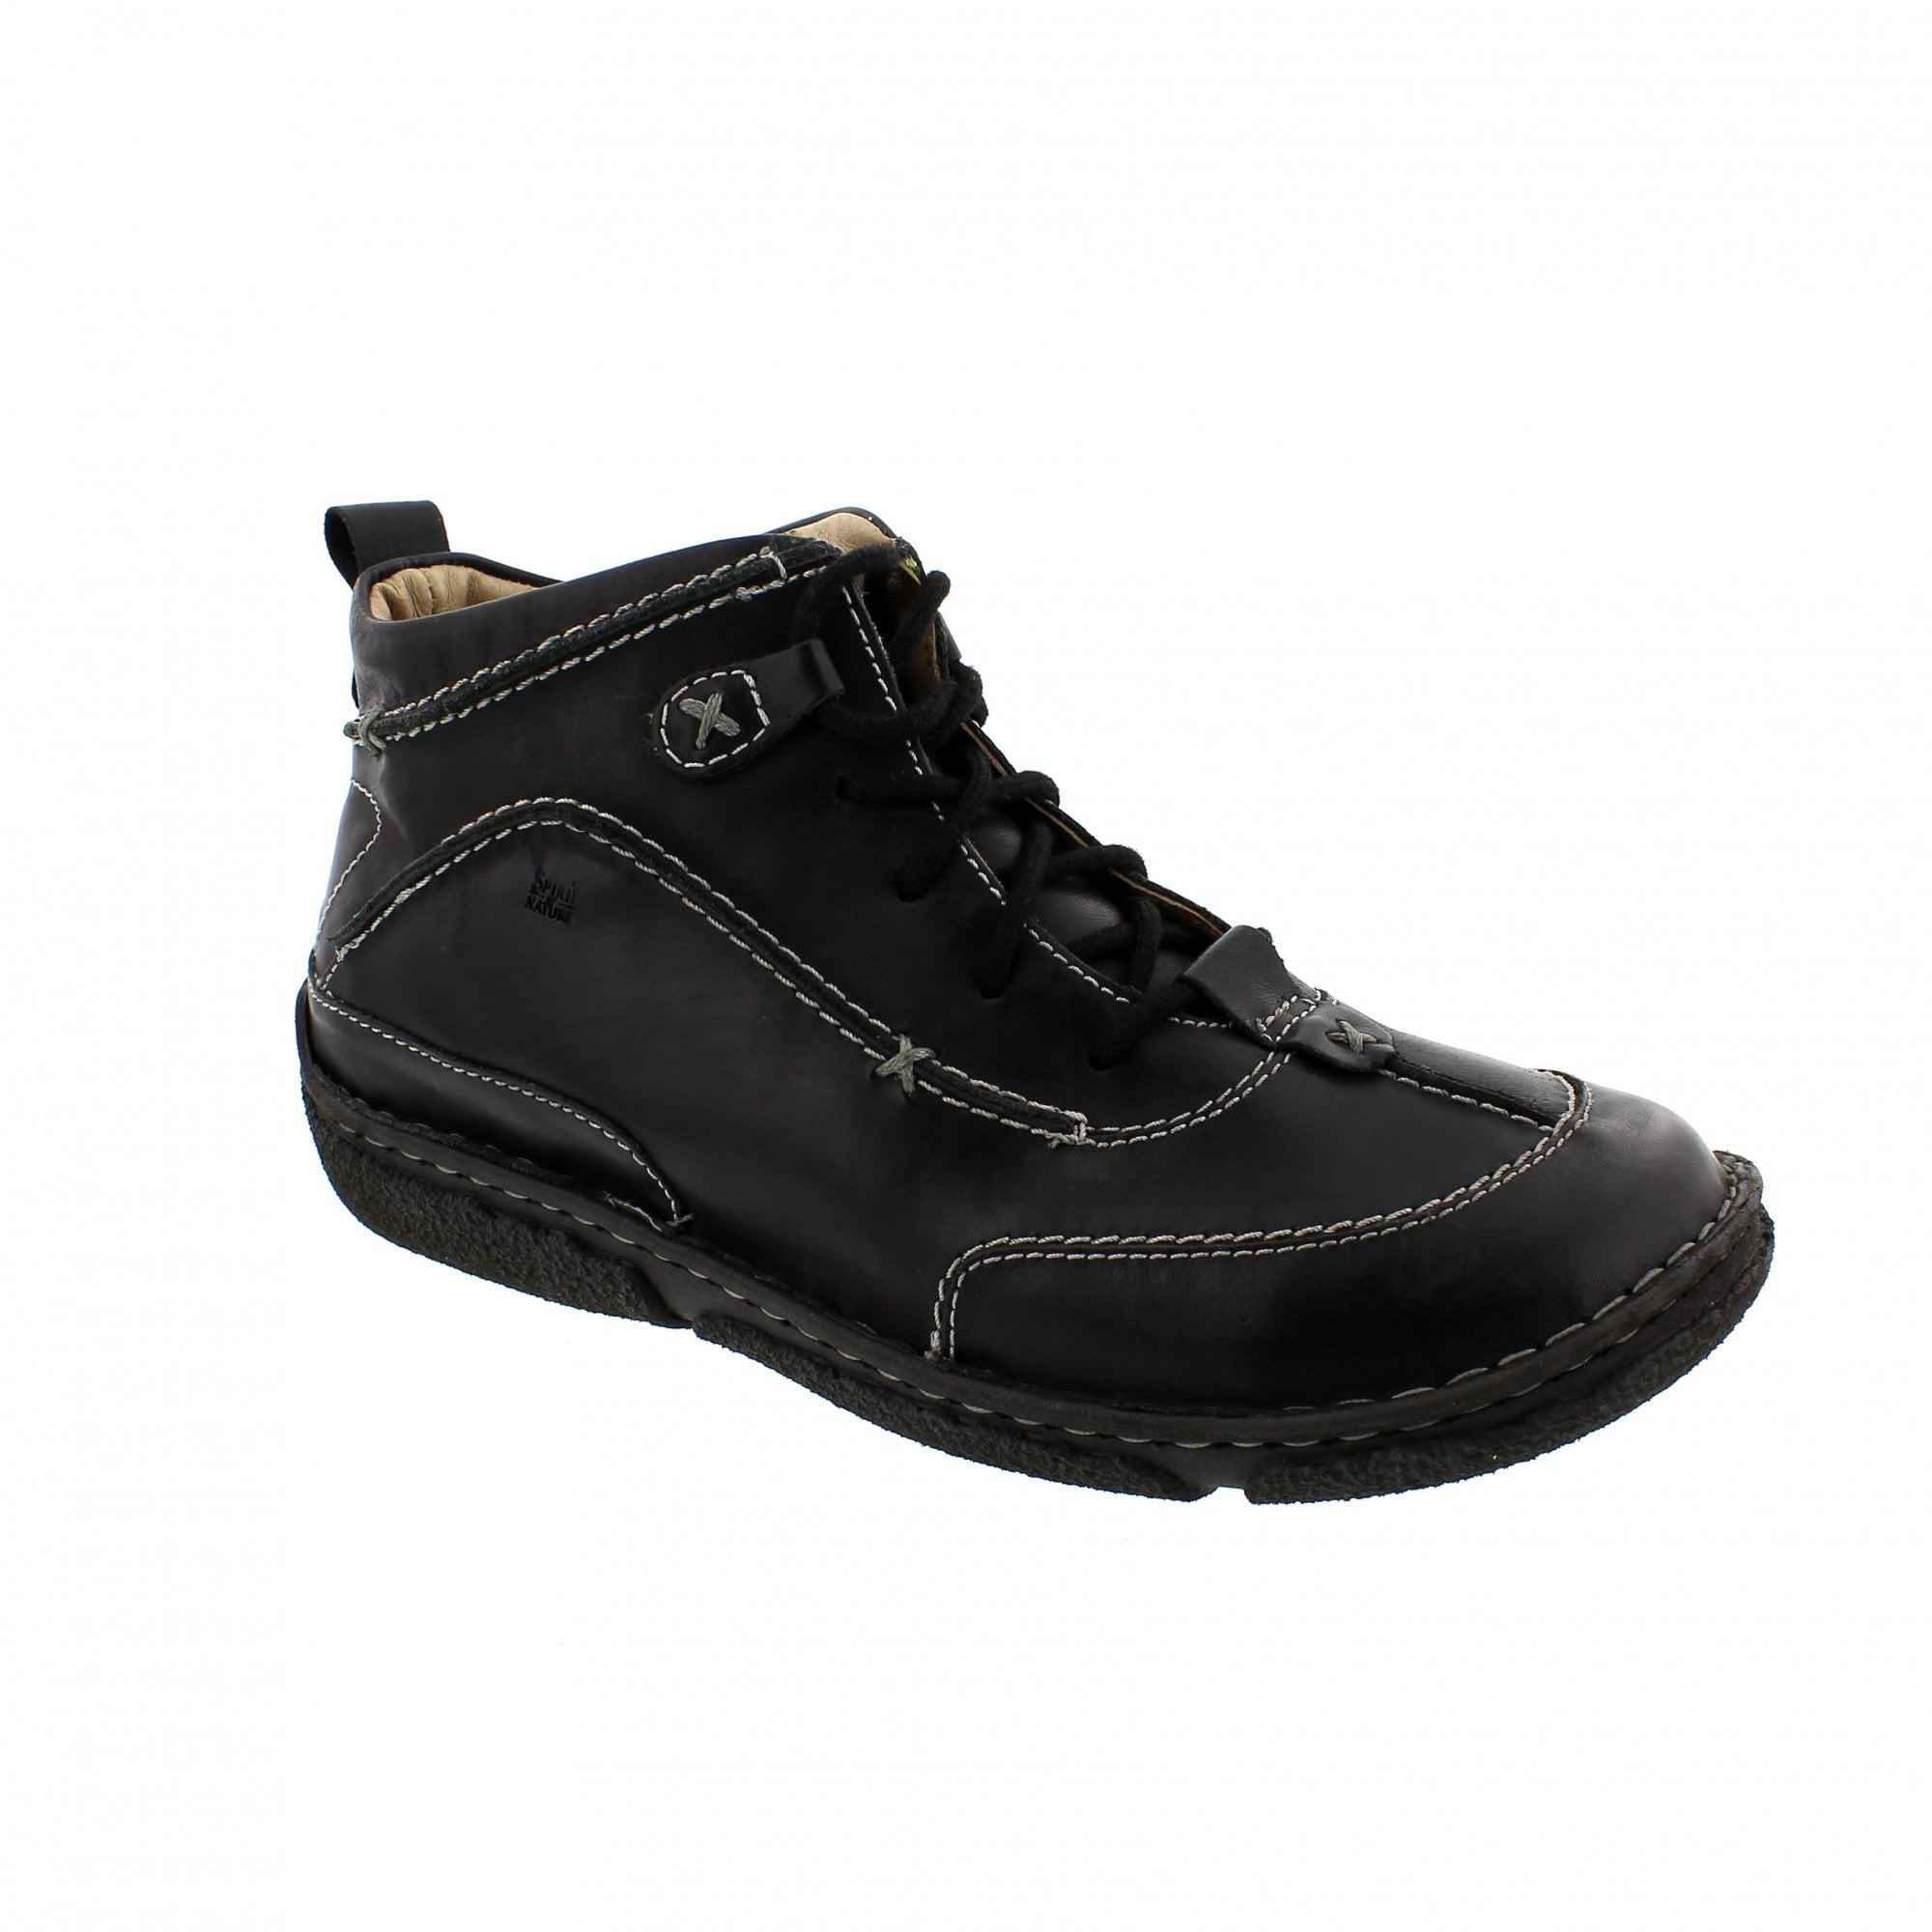 765594fb54c4eb Josef Seibel Nikki 85026-950600 Black Chukka Boots